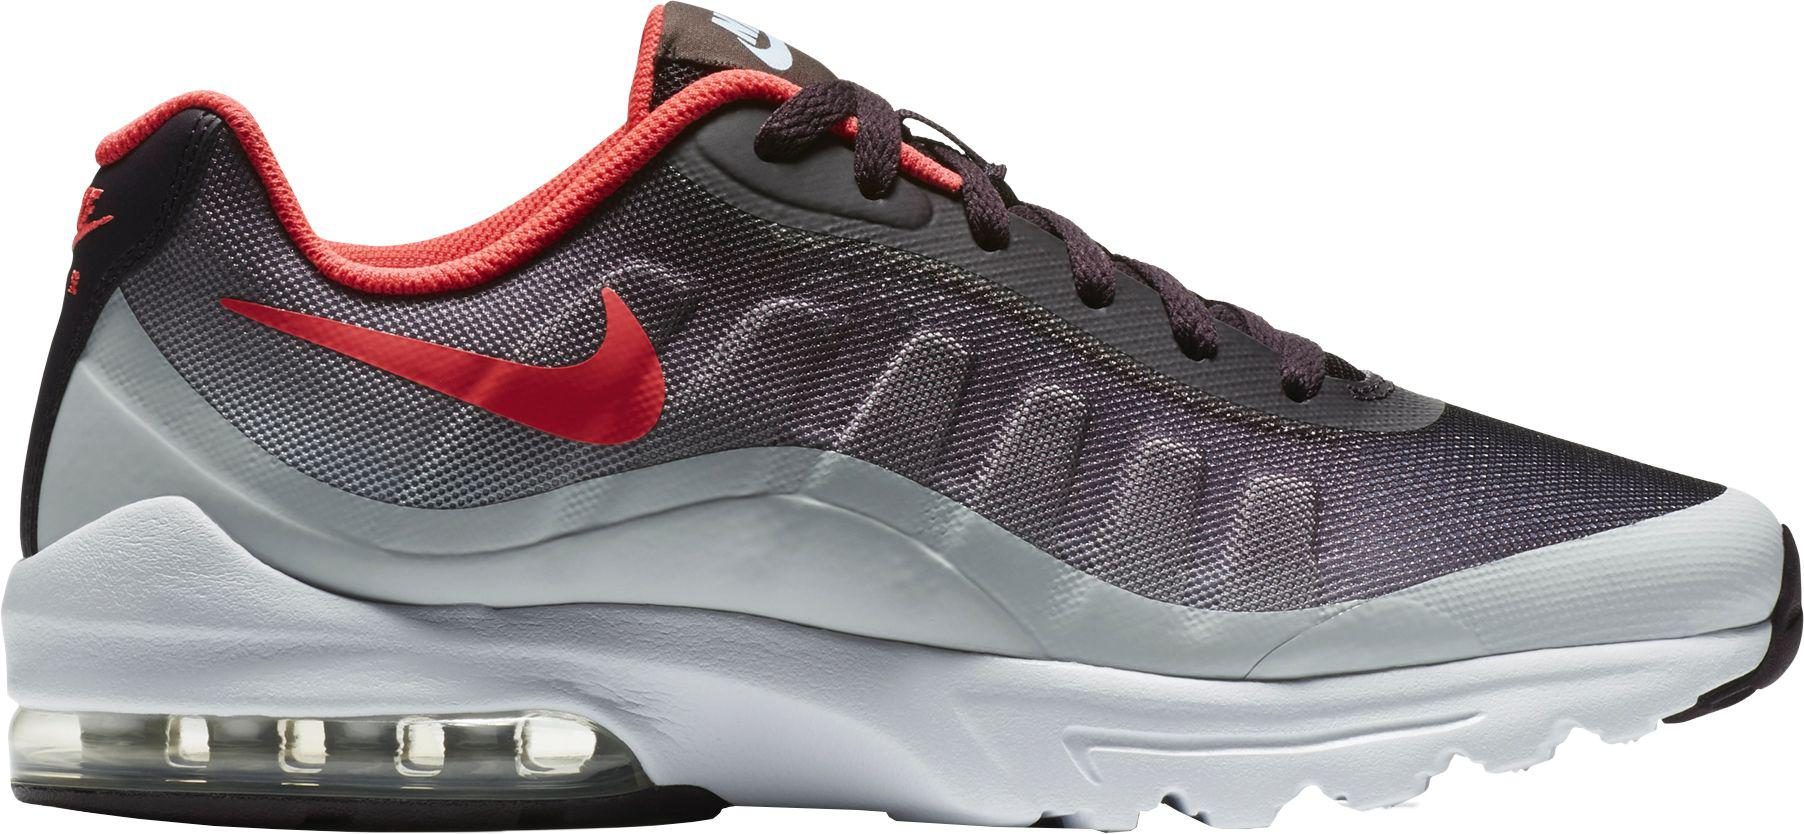 super popular 41416 807e9 Nike Air Max Invigor Prt Shoes in Gray for Men - Lyst